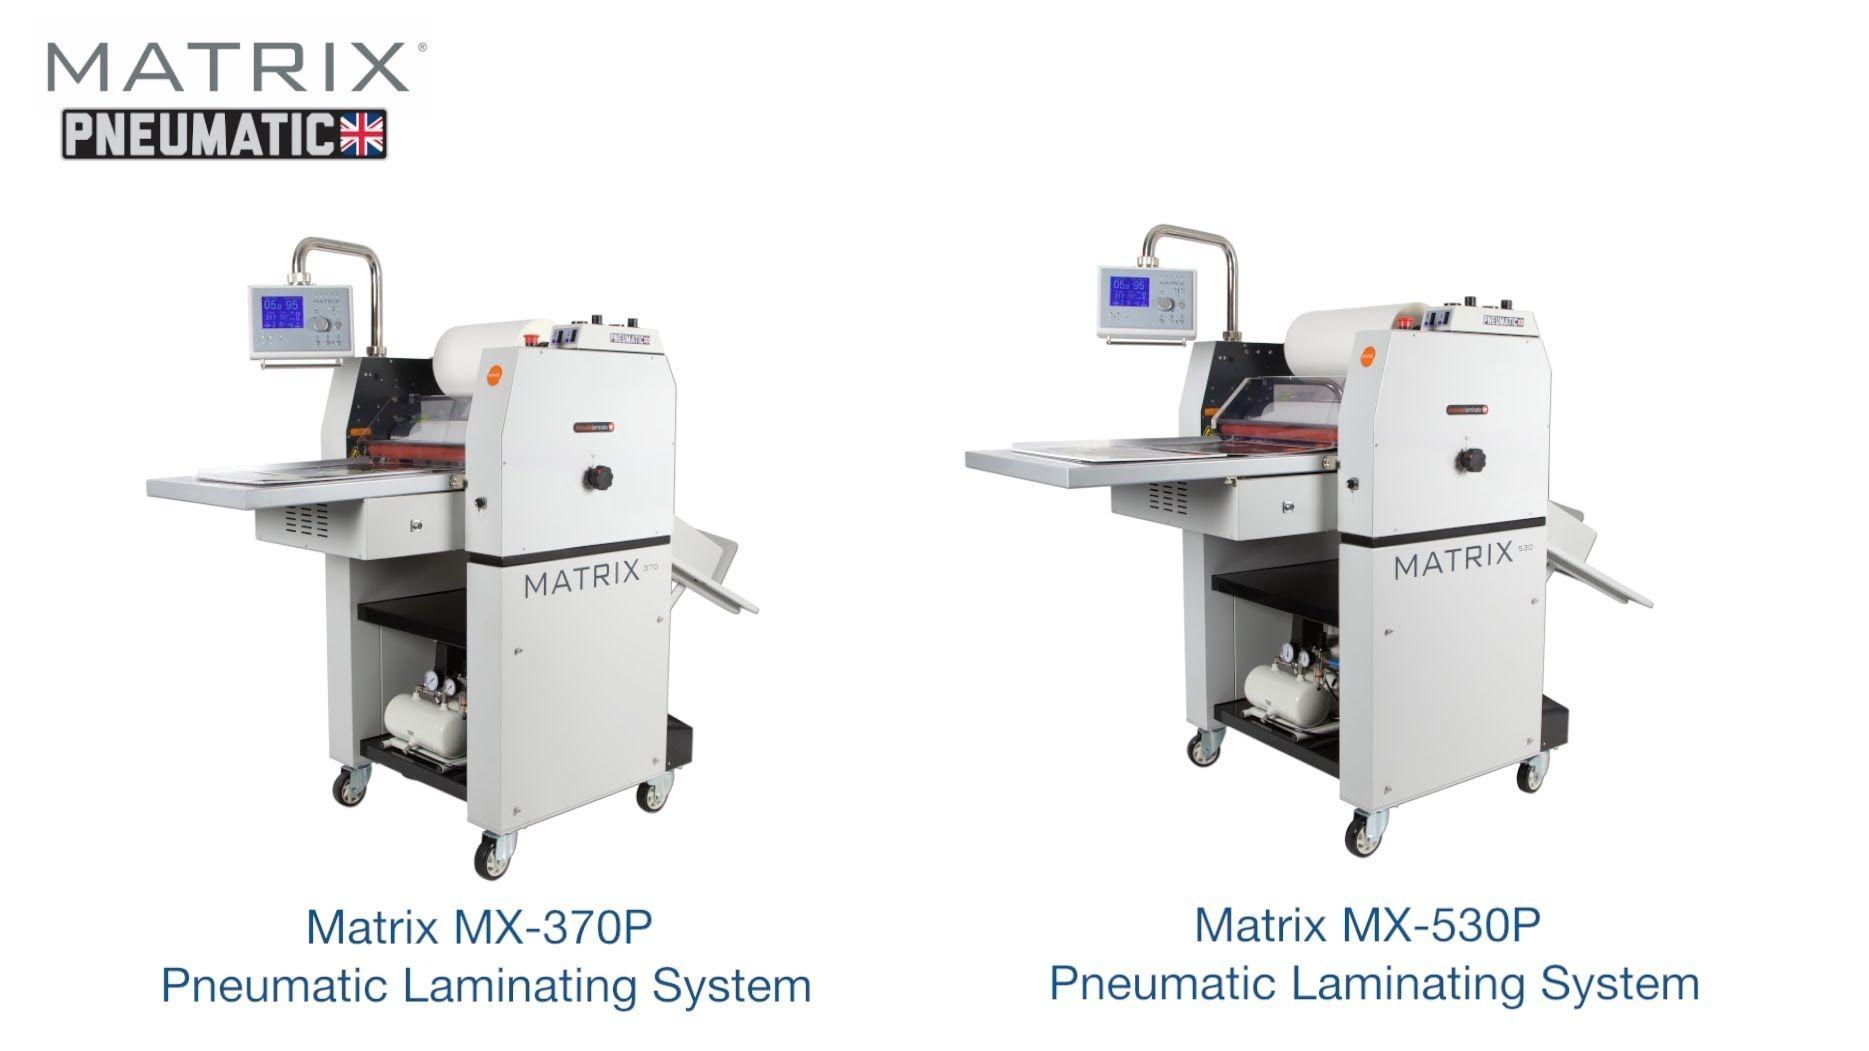 The Matrix Pneumatic Mx 370p Mx 530p Digital Print Laminating Machines Can Run Up To Twice The Speed Of Sta Laminated Machine Matrix Laminated Business Cards